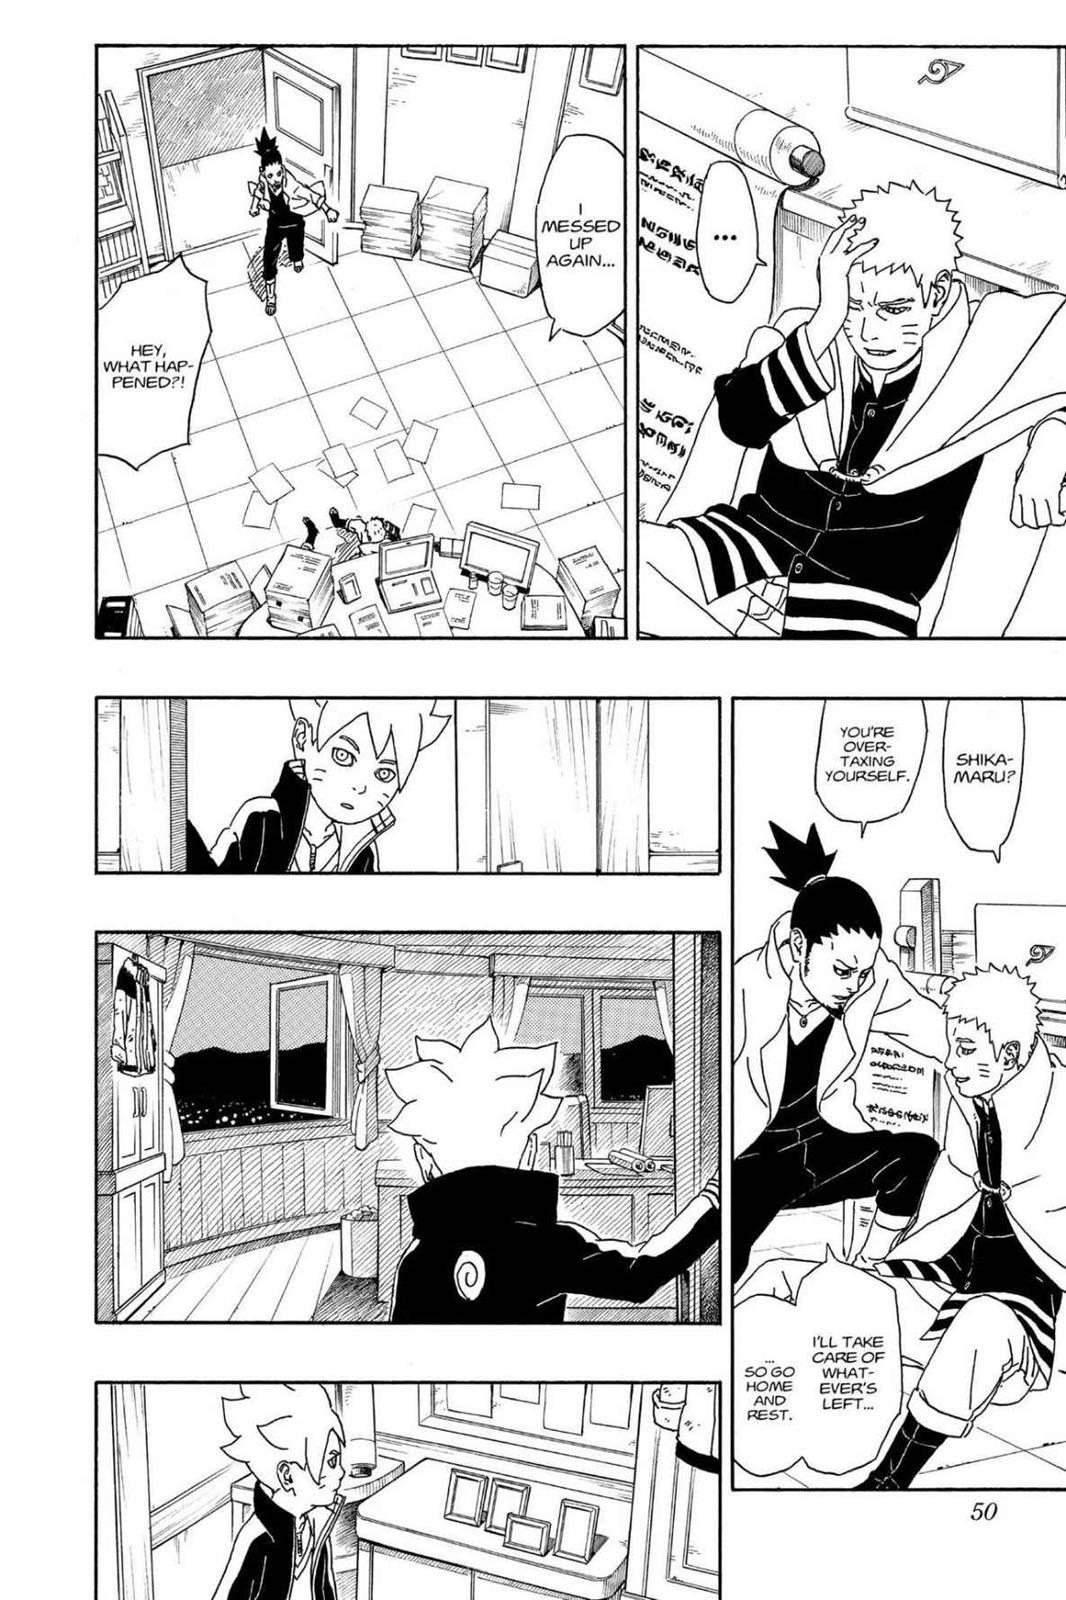 Boruto Naruto Next Generations Chapter 001 Boruto